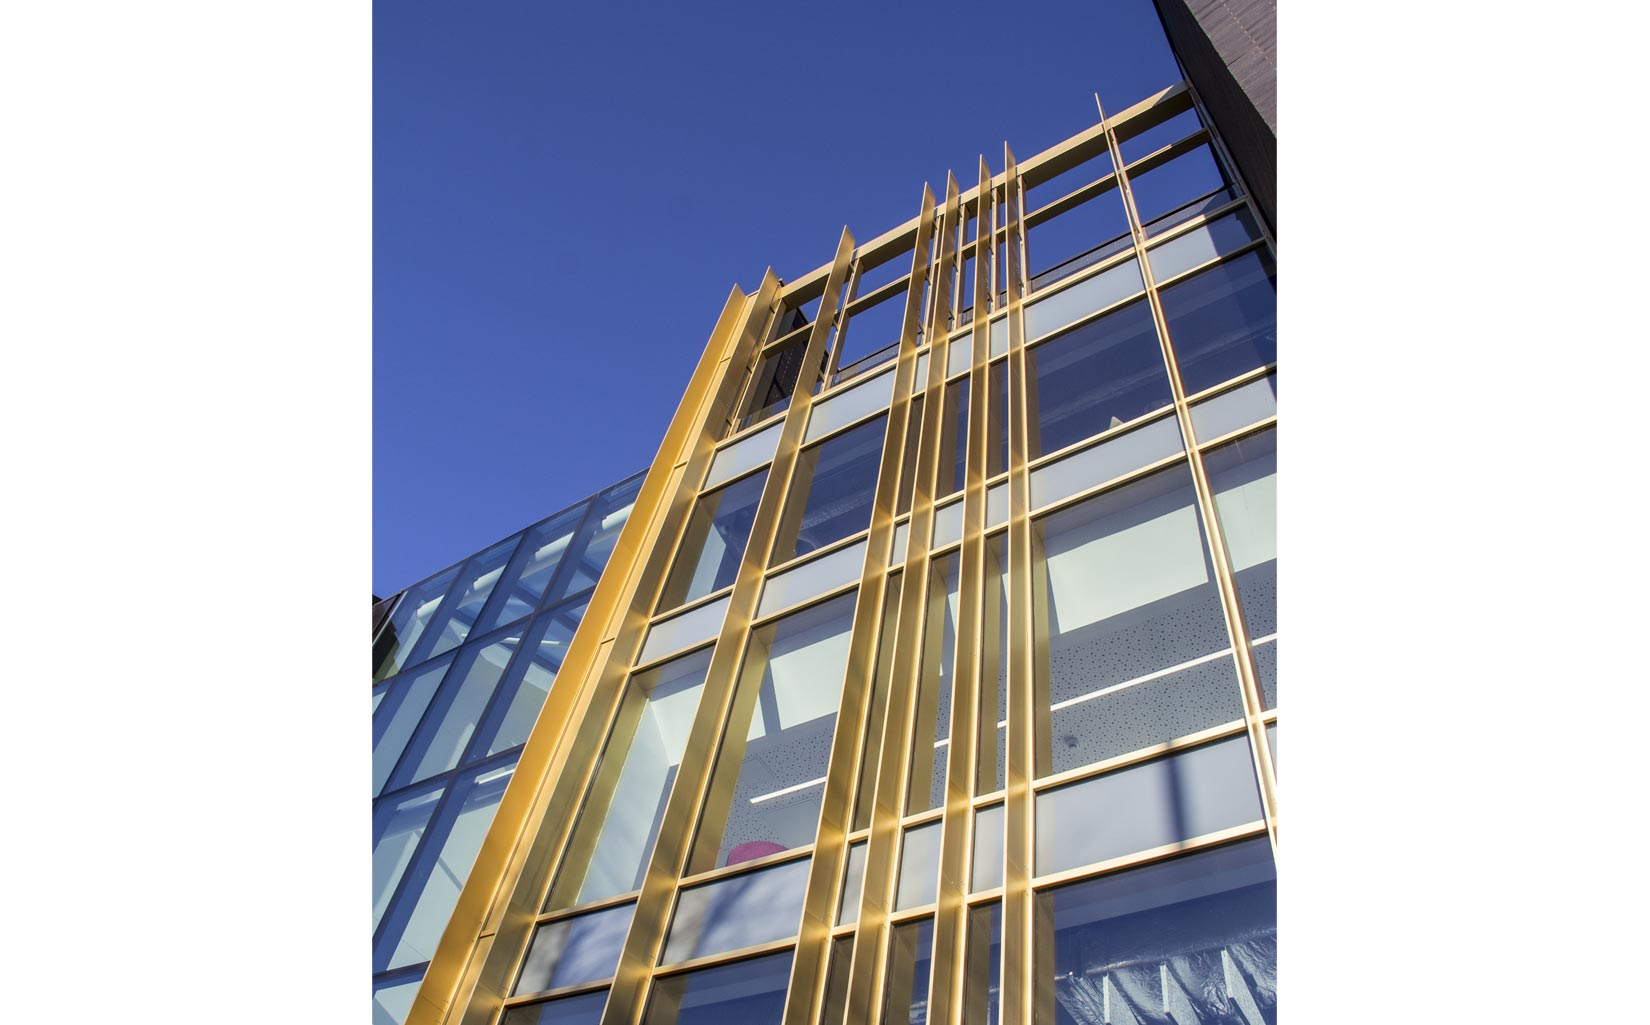 Leeds Arts University, Façade Detail